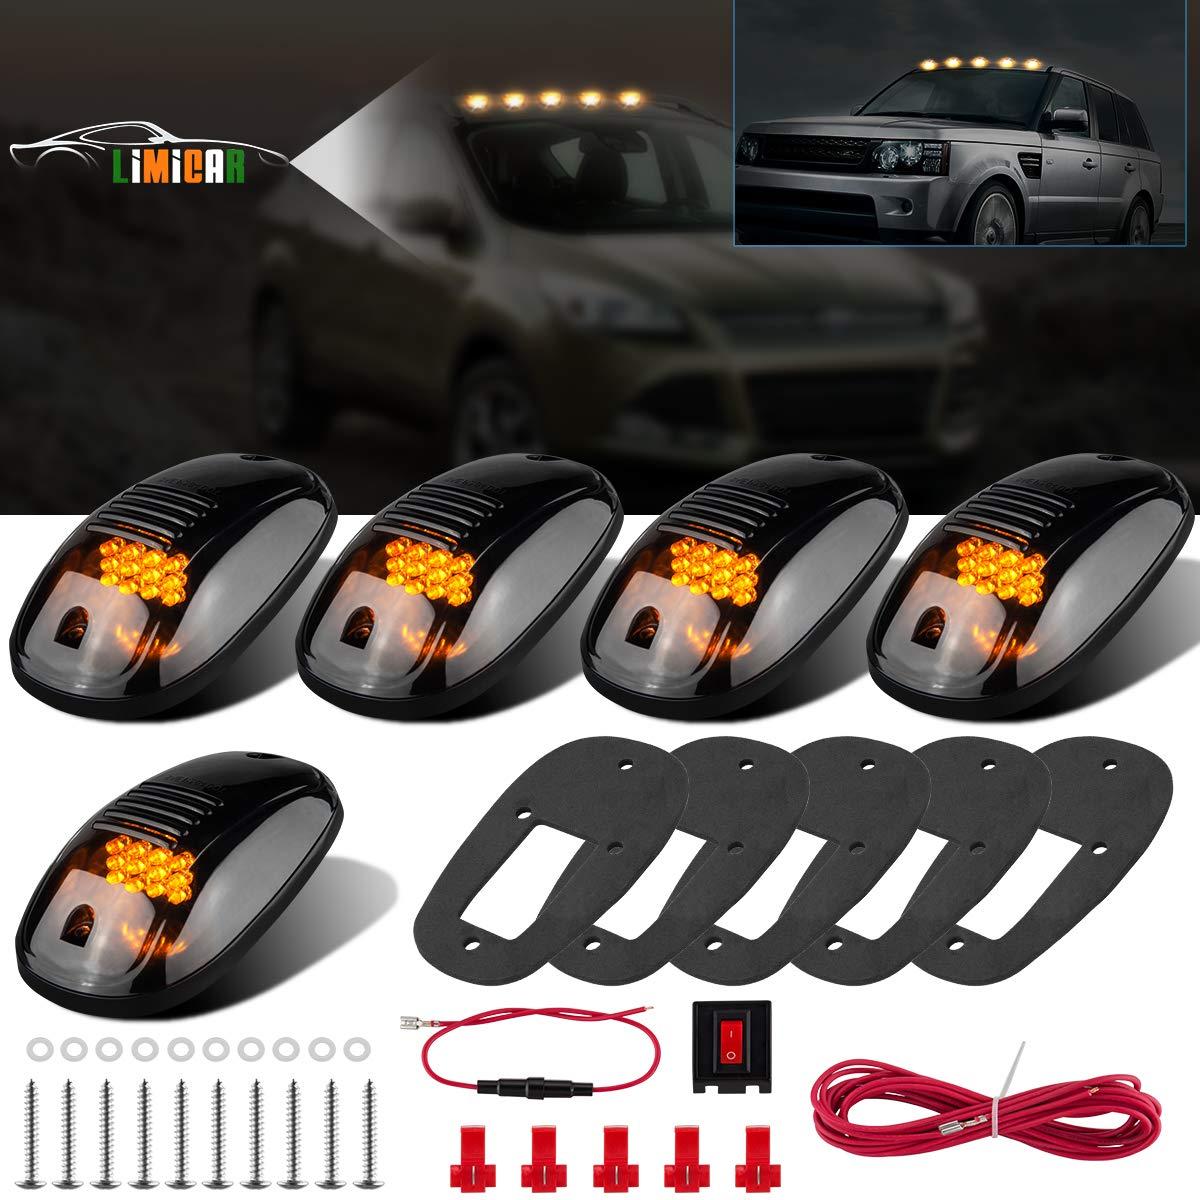 LIMICAR 5X Amber Cab Roof Marker Top Running 12LED Cab Lights Compatible w/ 03-10 Dodge Ram 1500 2500 3500 4500 11-16 Ram 1500 2500 3500 4500 5500 Pickup Trucks w/Stock Cab Marker Lights 71kgVHqeVeL